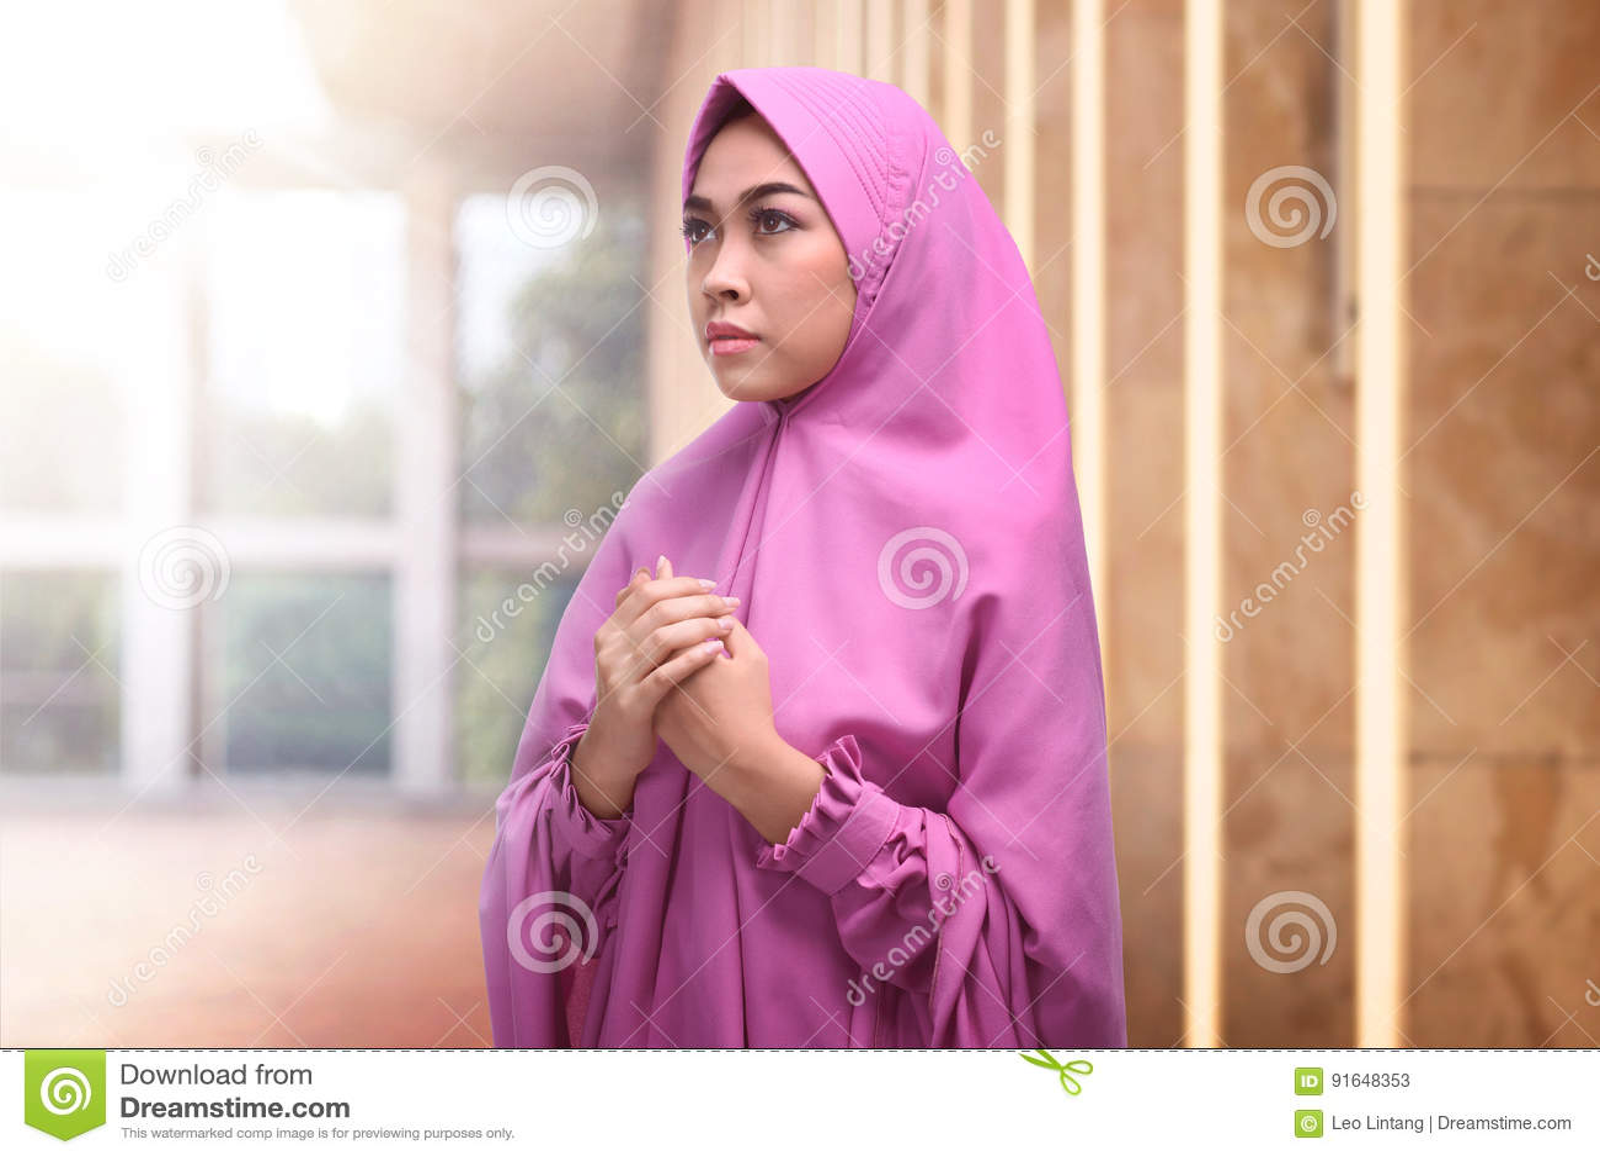 Young Asian Muslim Woman In Hijab Dress Praying Stock Image - Image Of Indonesian -5957